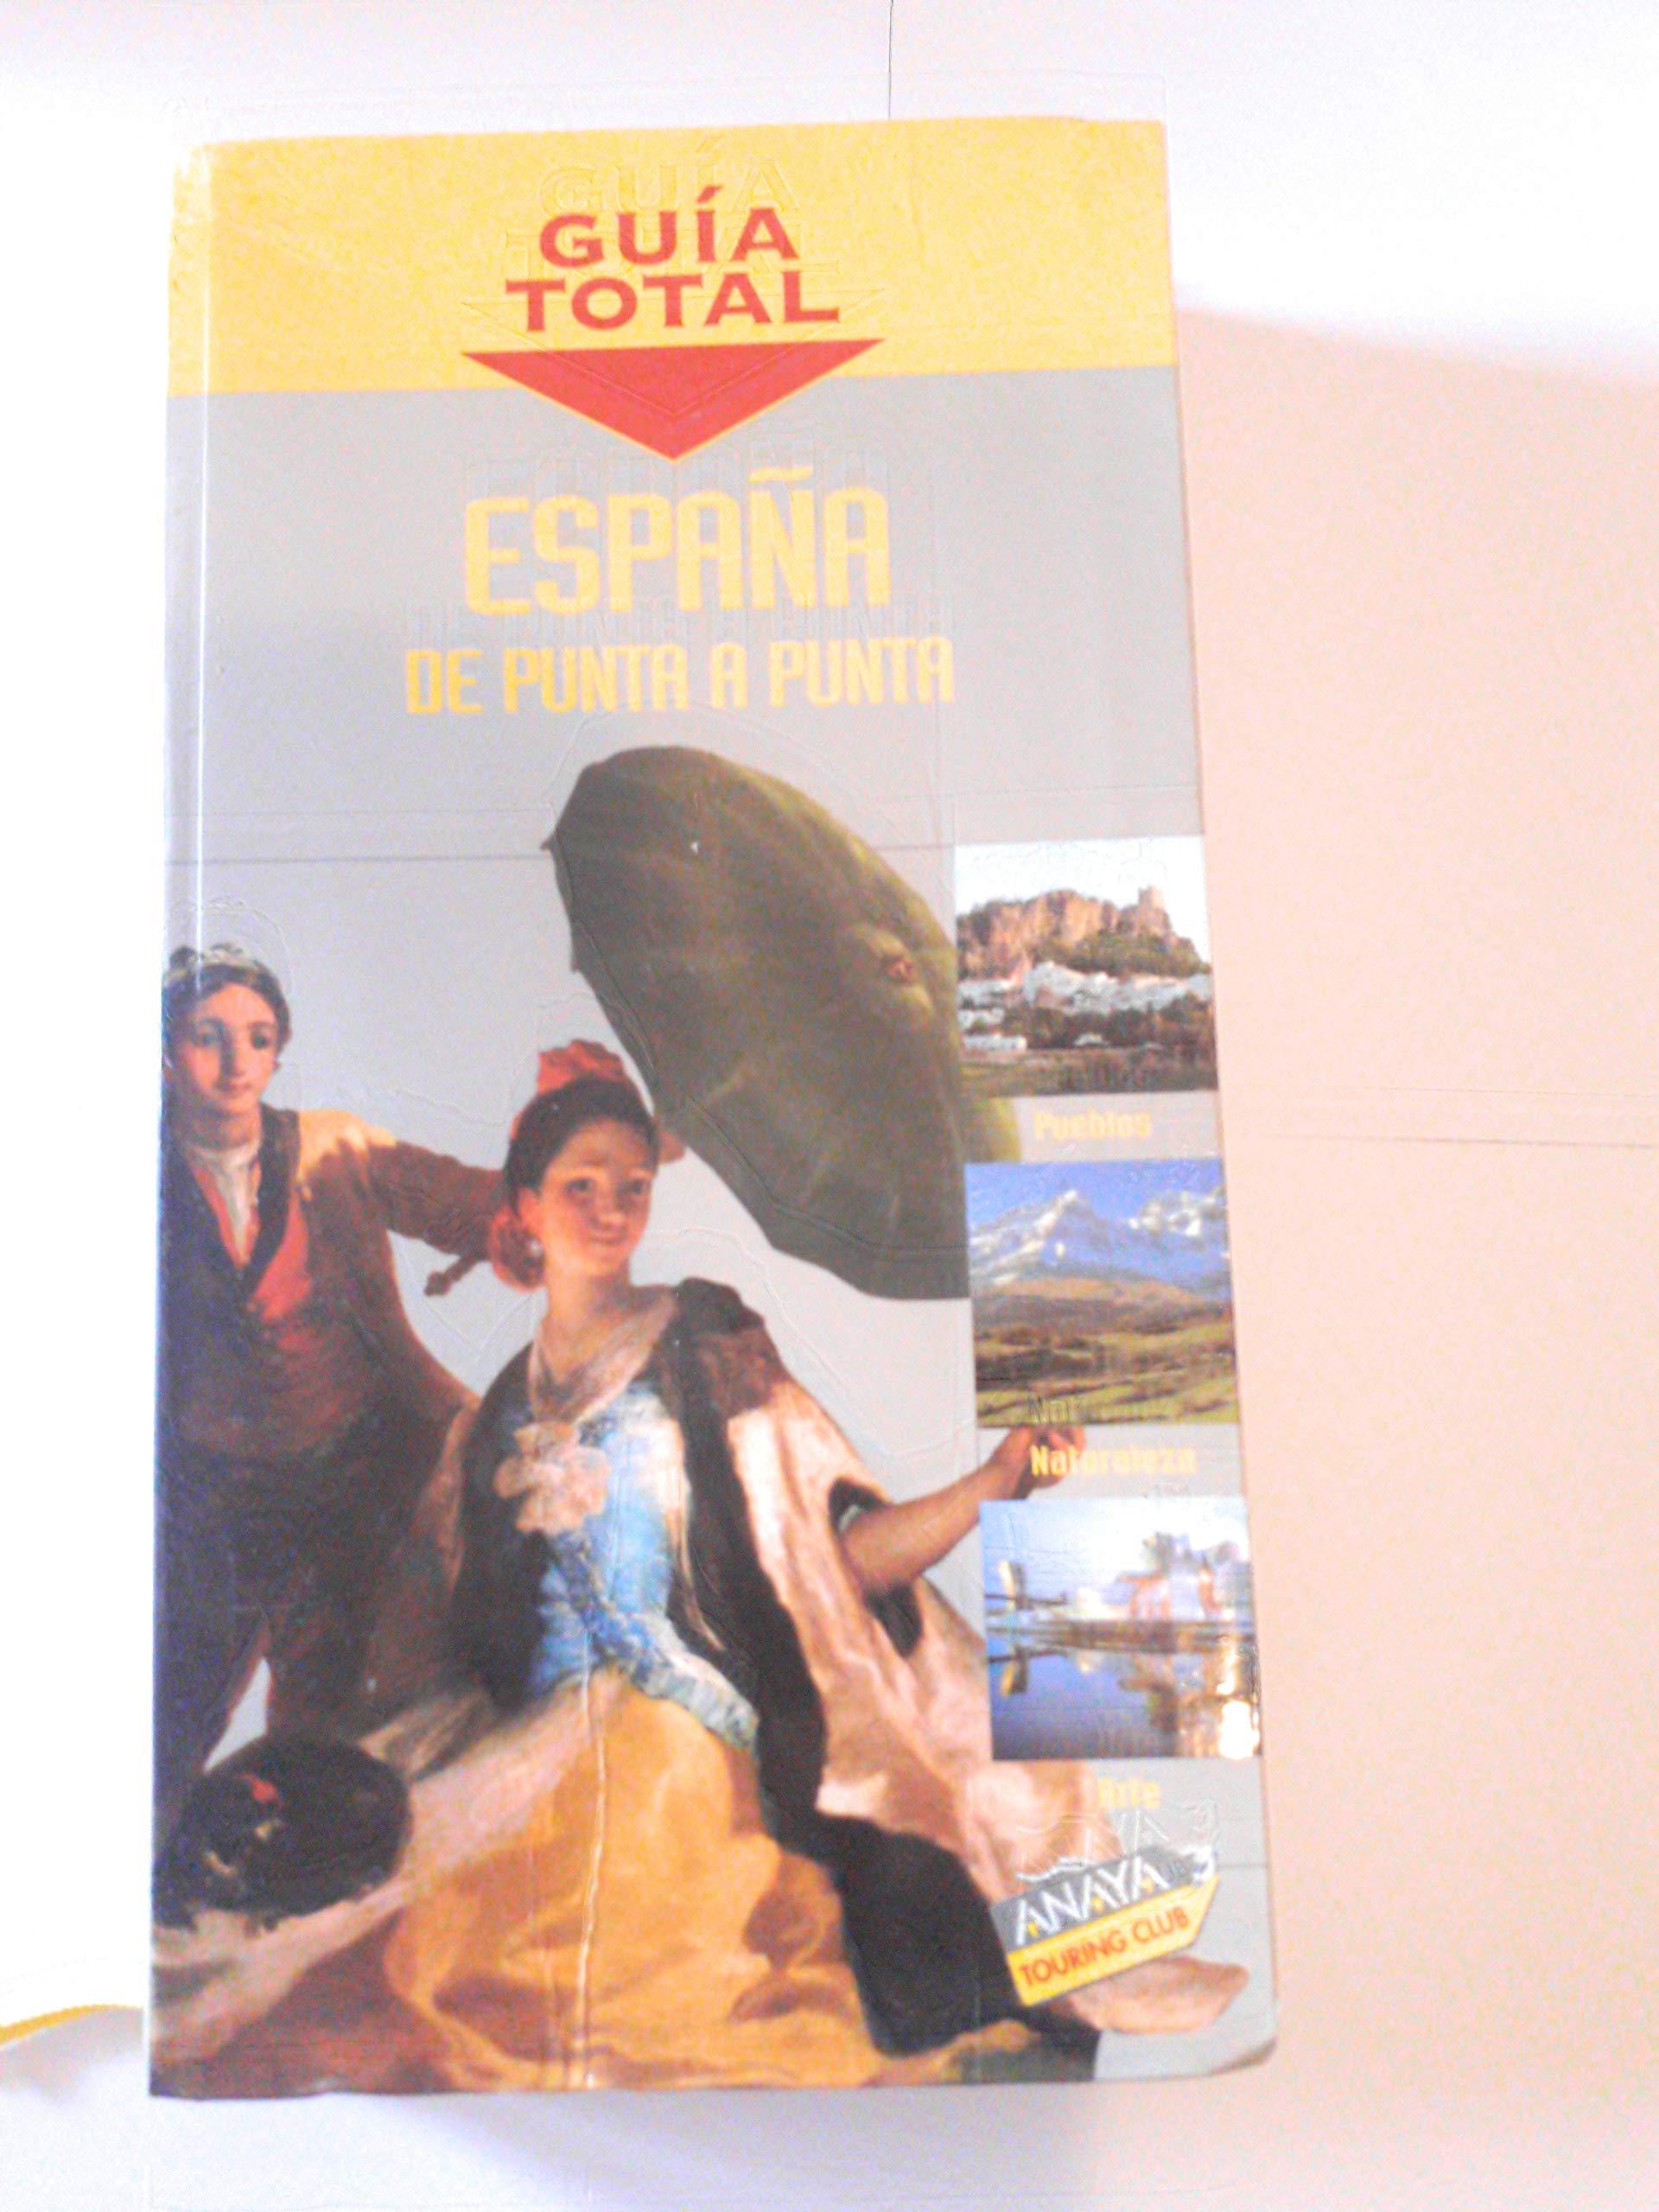 España de punta a punta (guia total): Amazon.es: Molina, Rafael Arjona: Libros